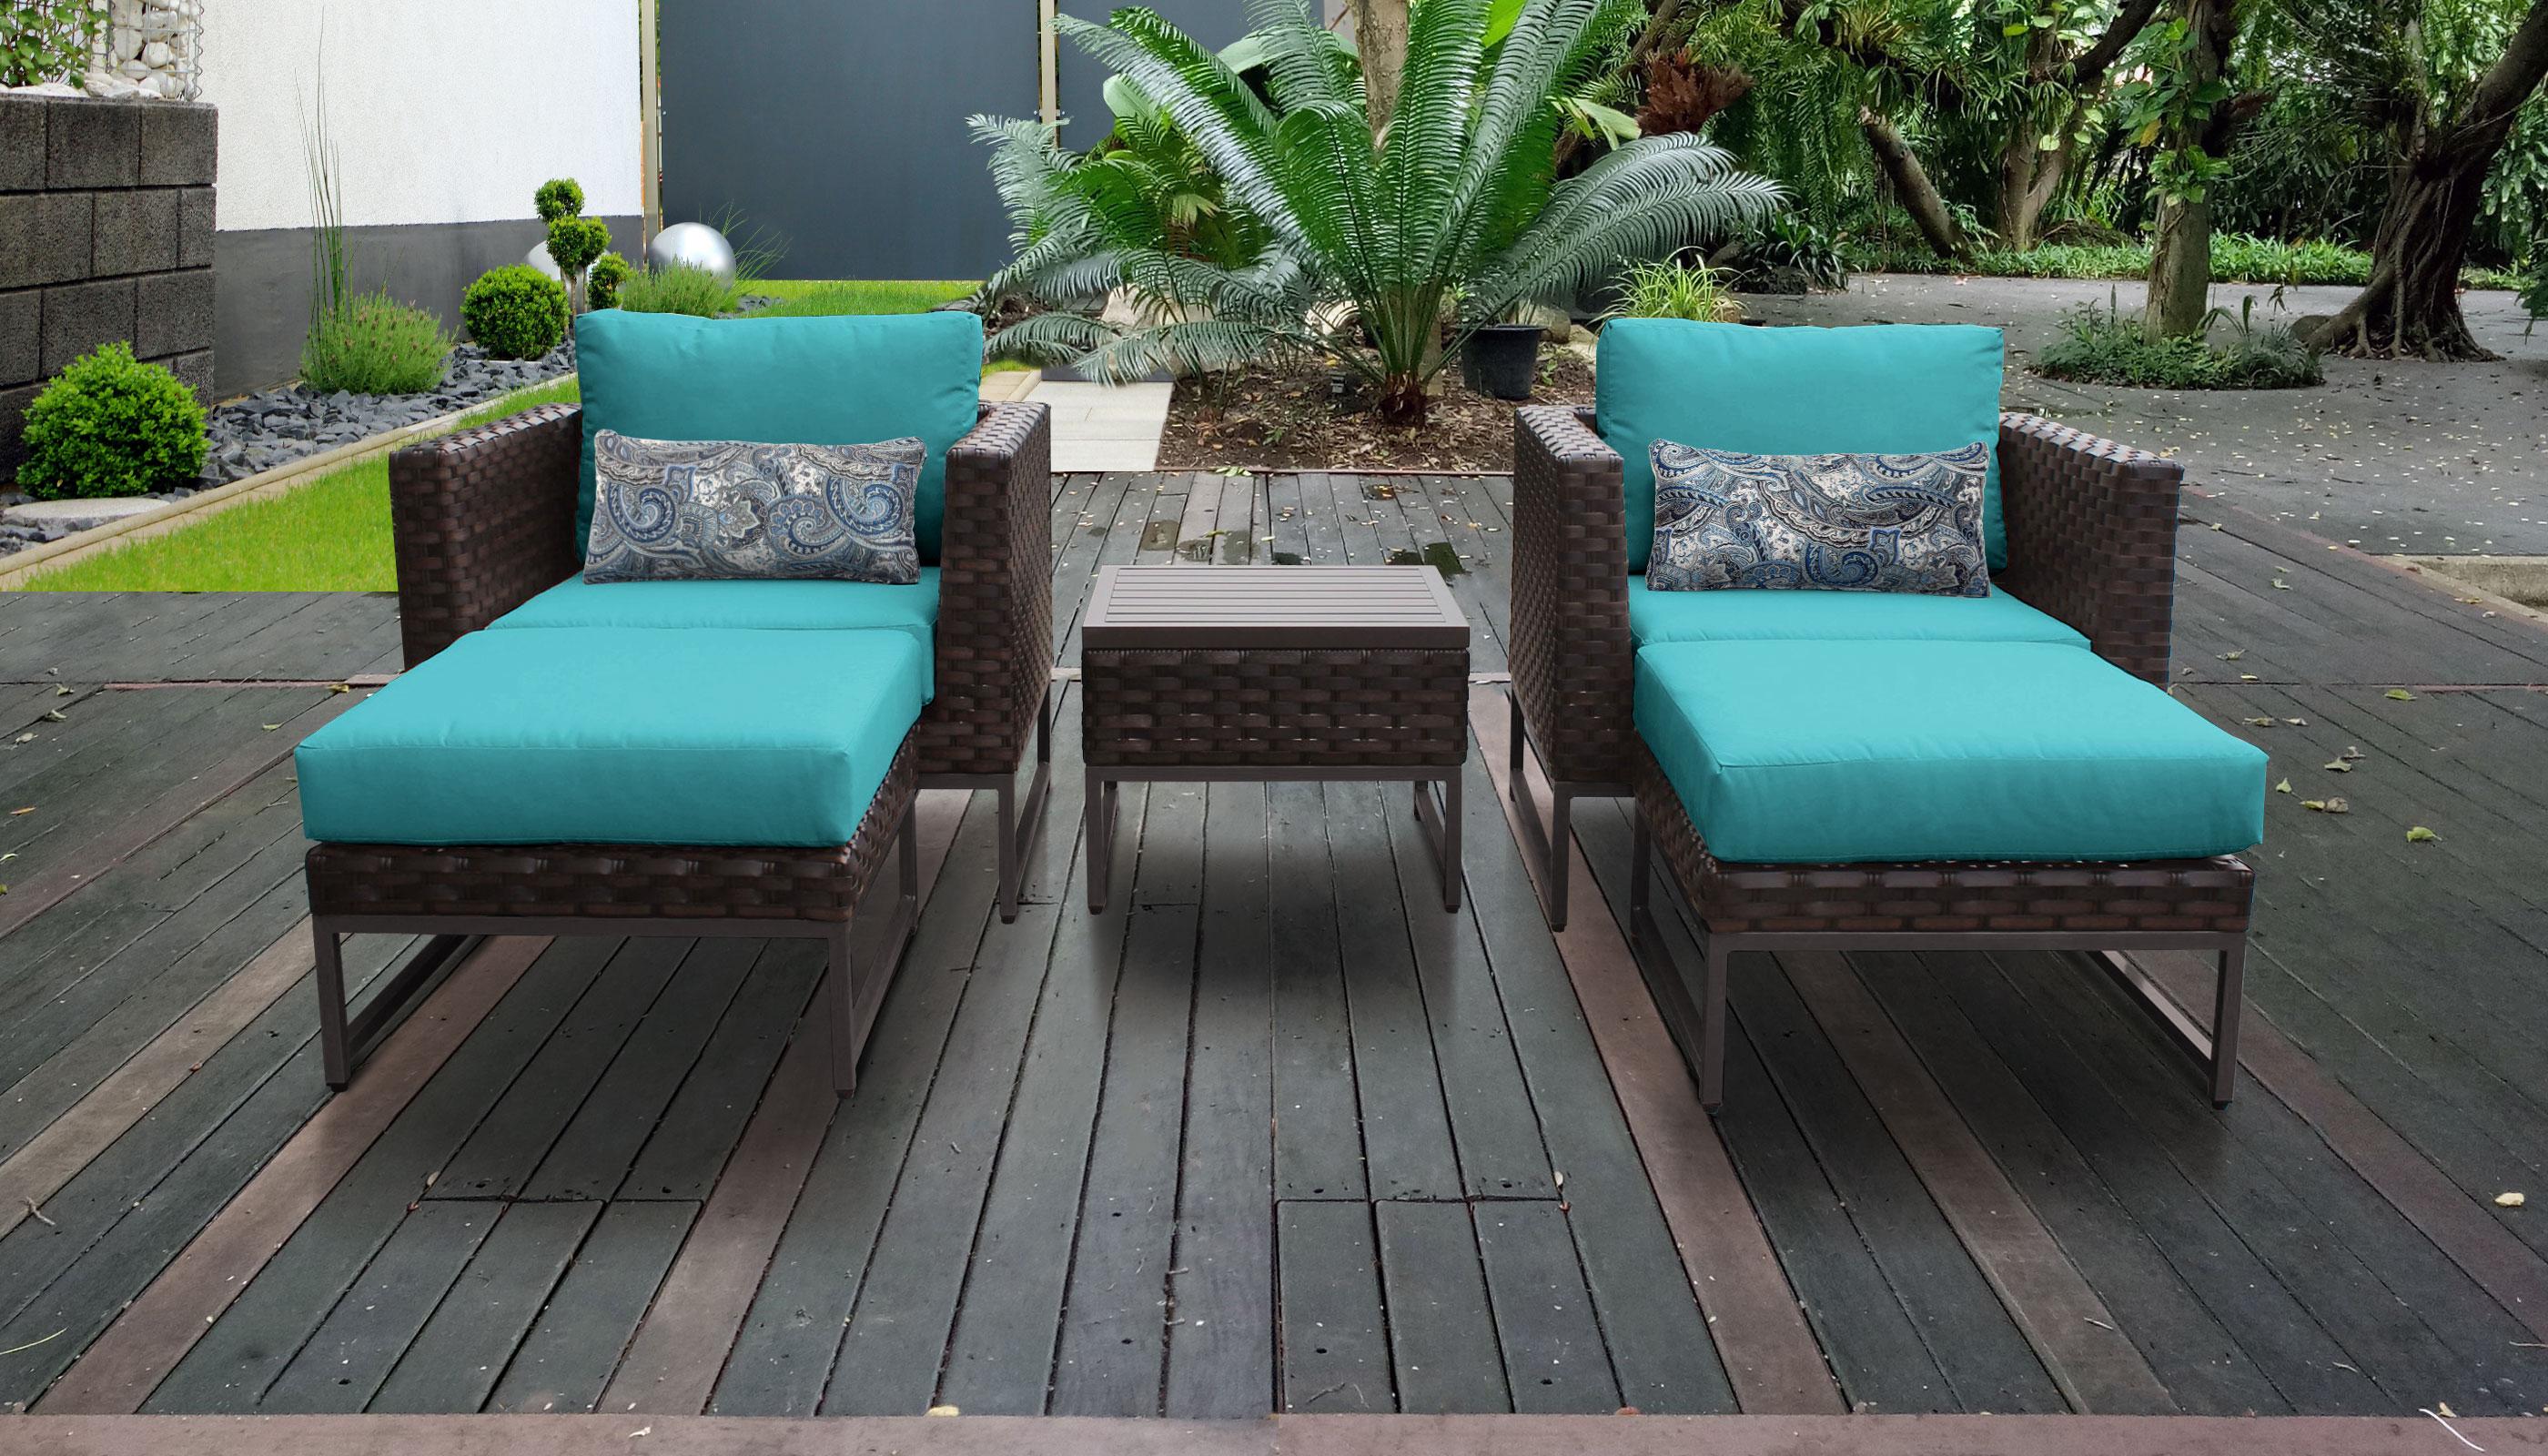 Barcelona 5 Piece Outdoor Wicker Patio Furniture Set 05b